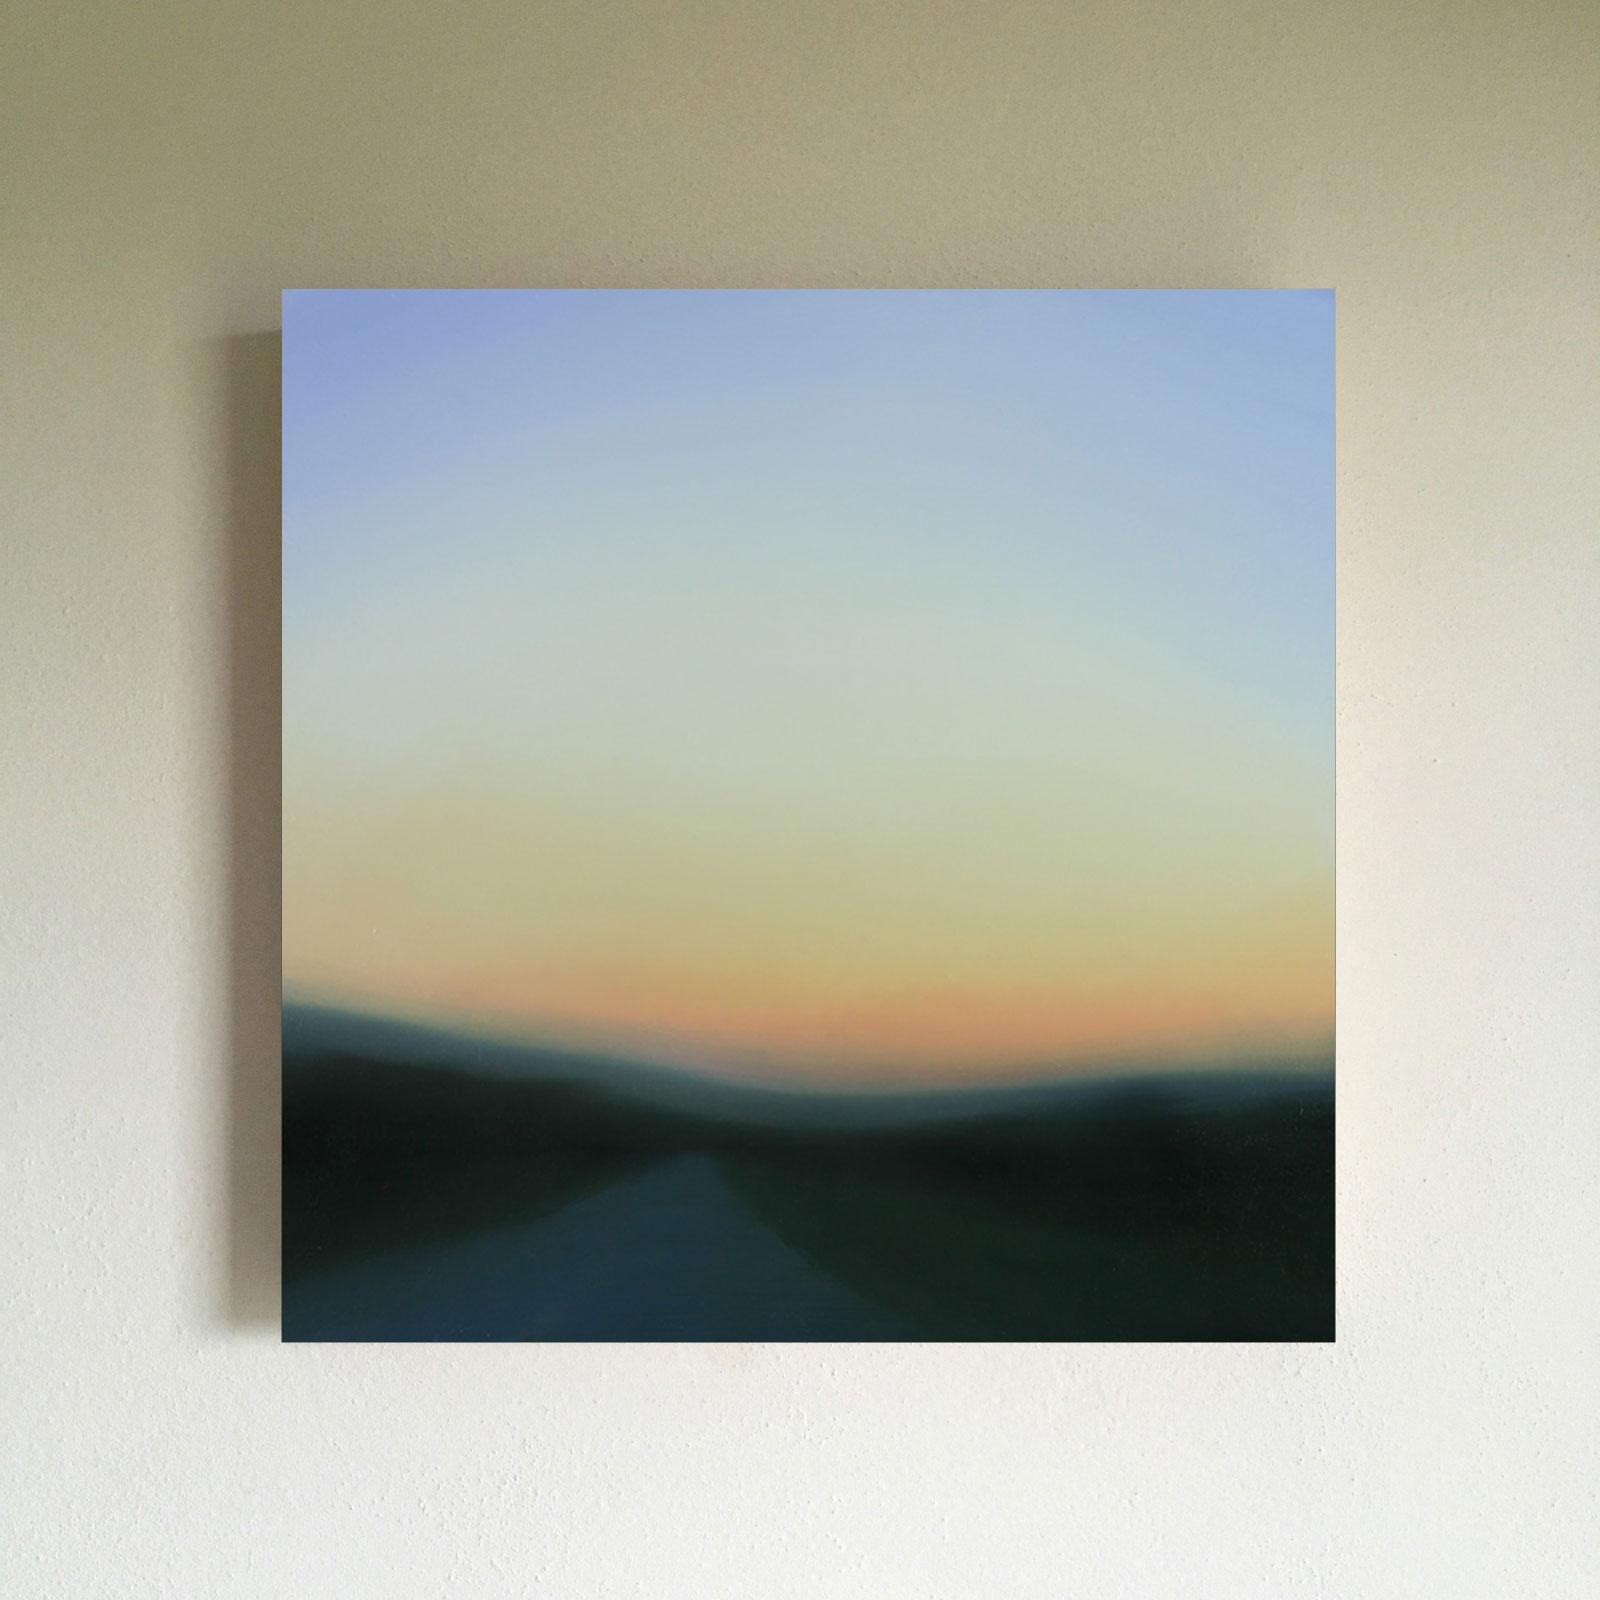 T88-2012, oil on canvas, 45x45cm, priv. coll.